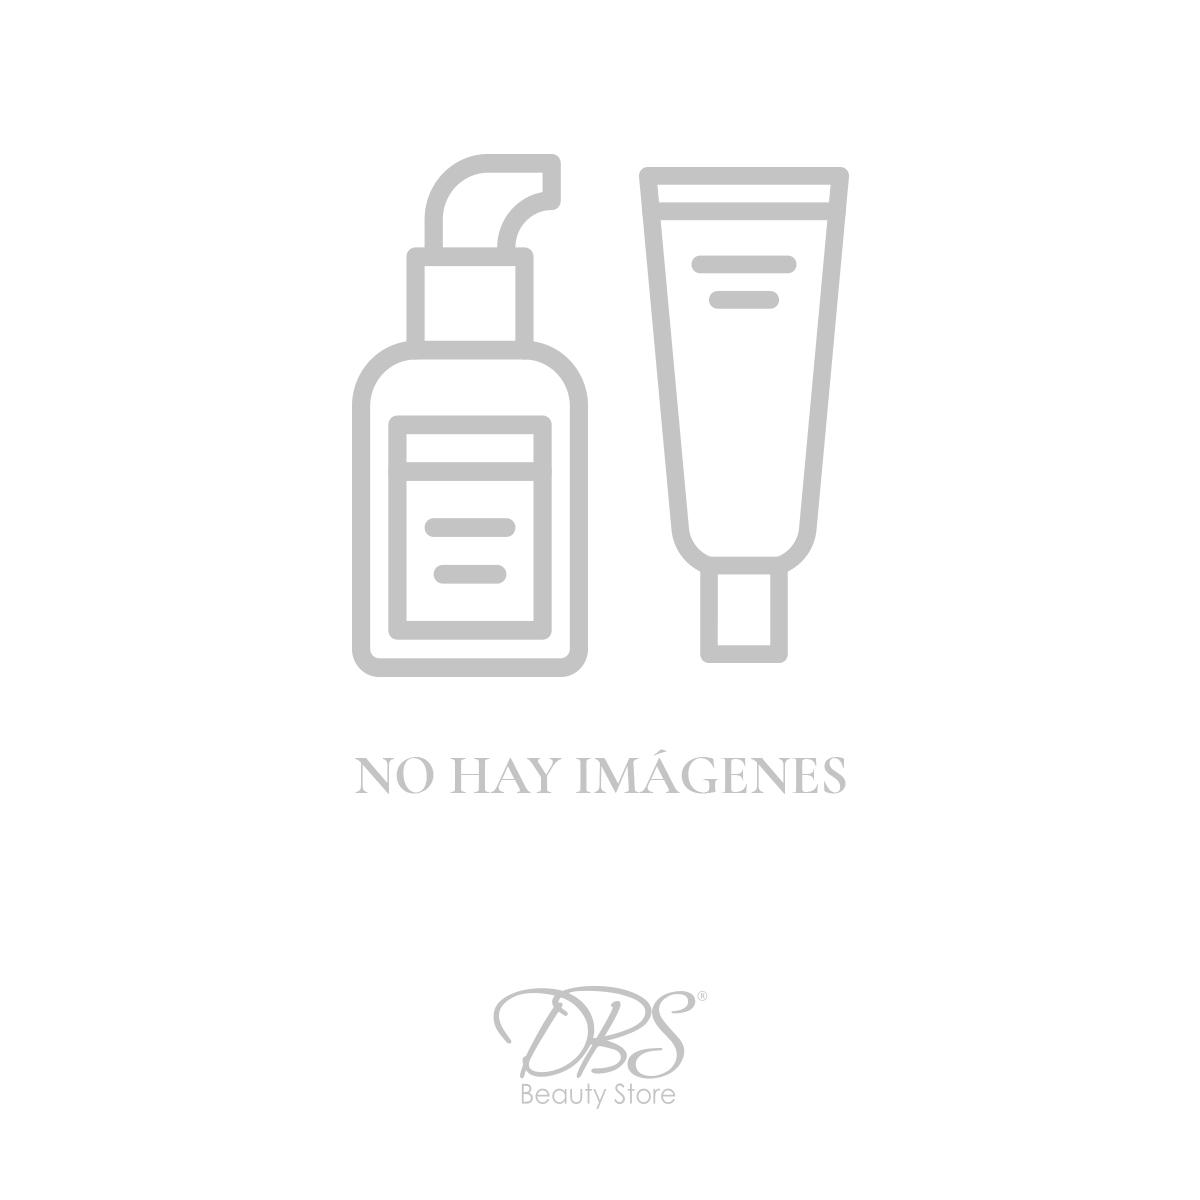 beauty-tools-BY-YS002-MP.jpg